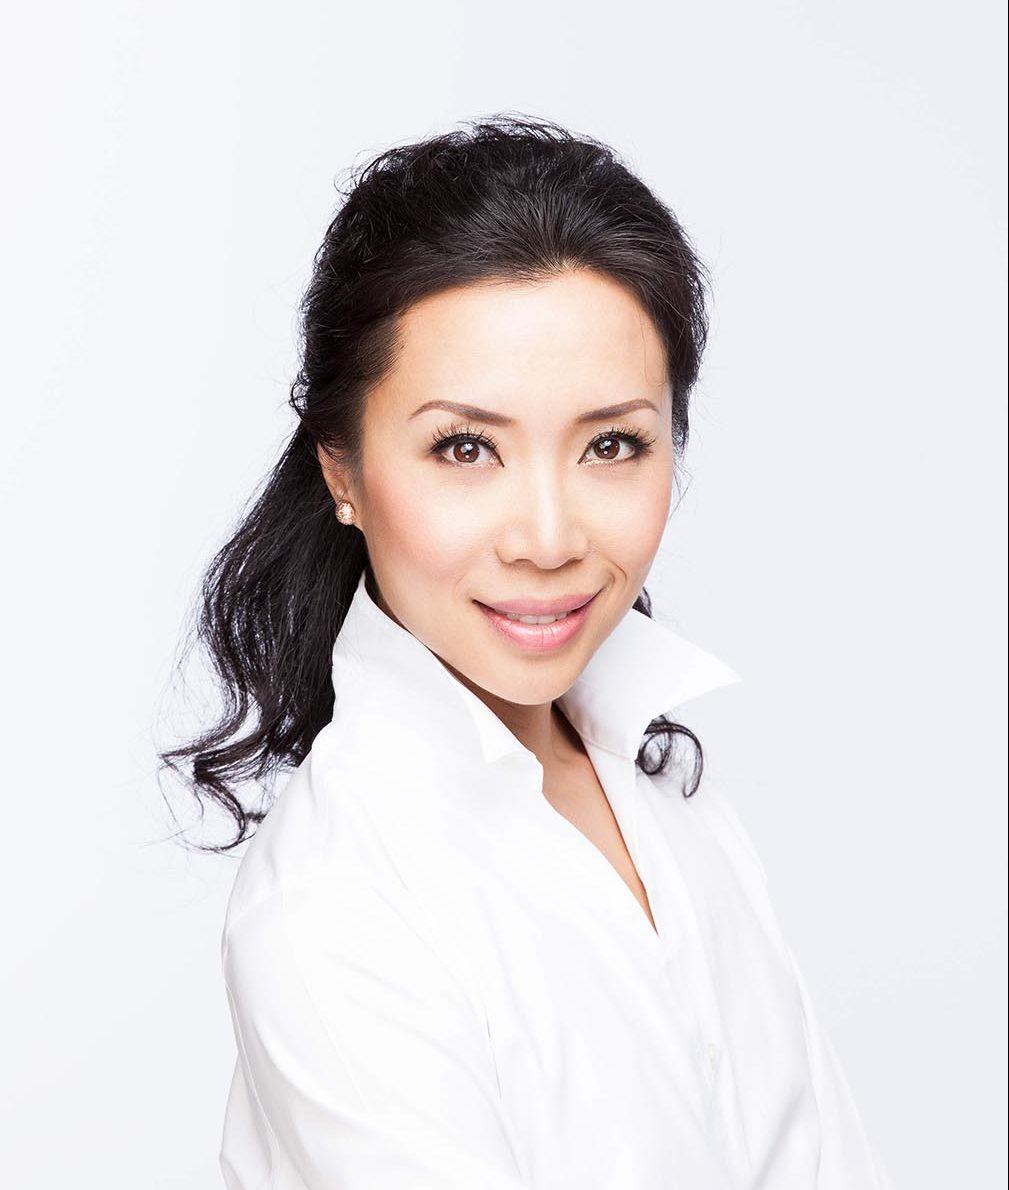 Principal dancer Xiao Nan Yu of The National Ballet of Canada retires after an illustrious career.